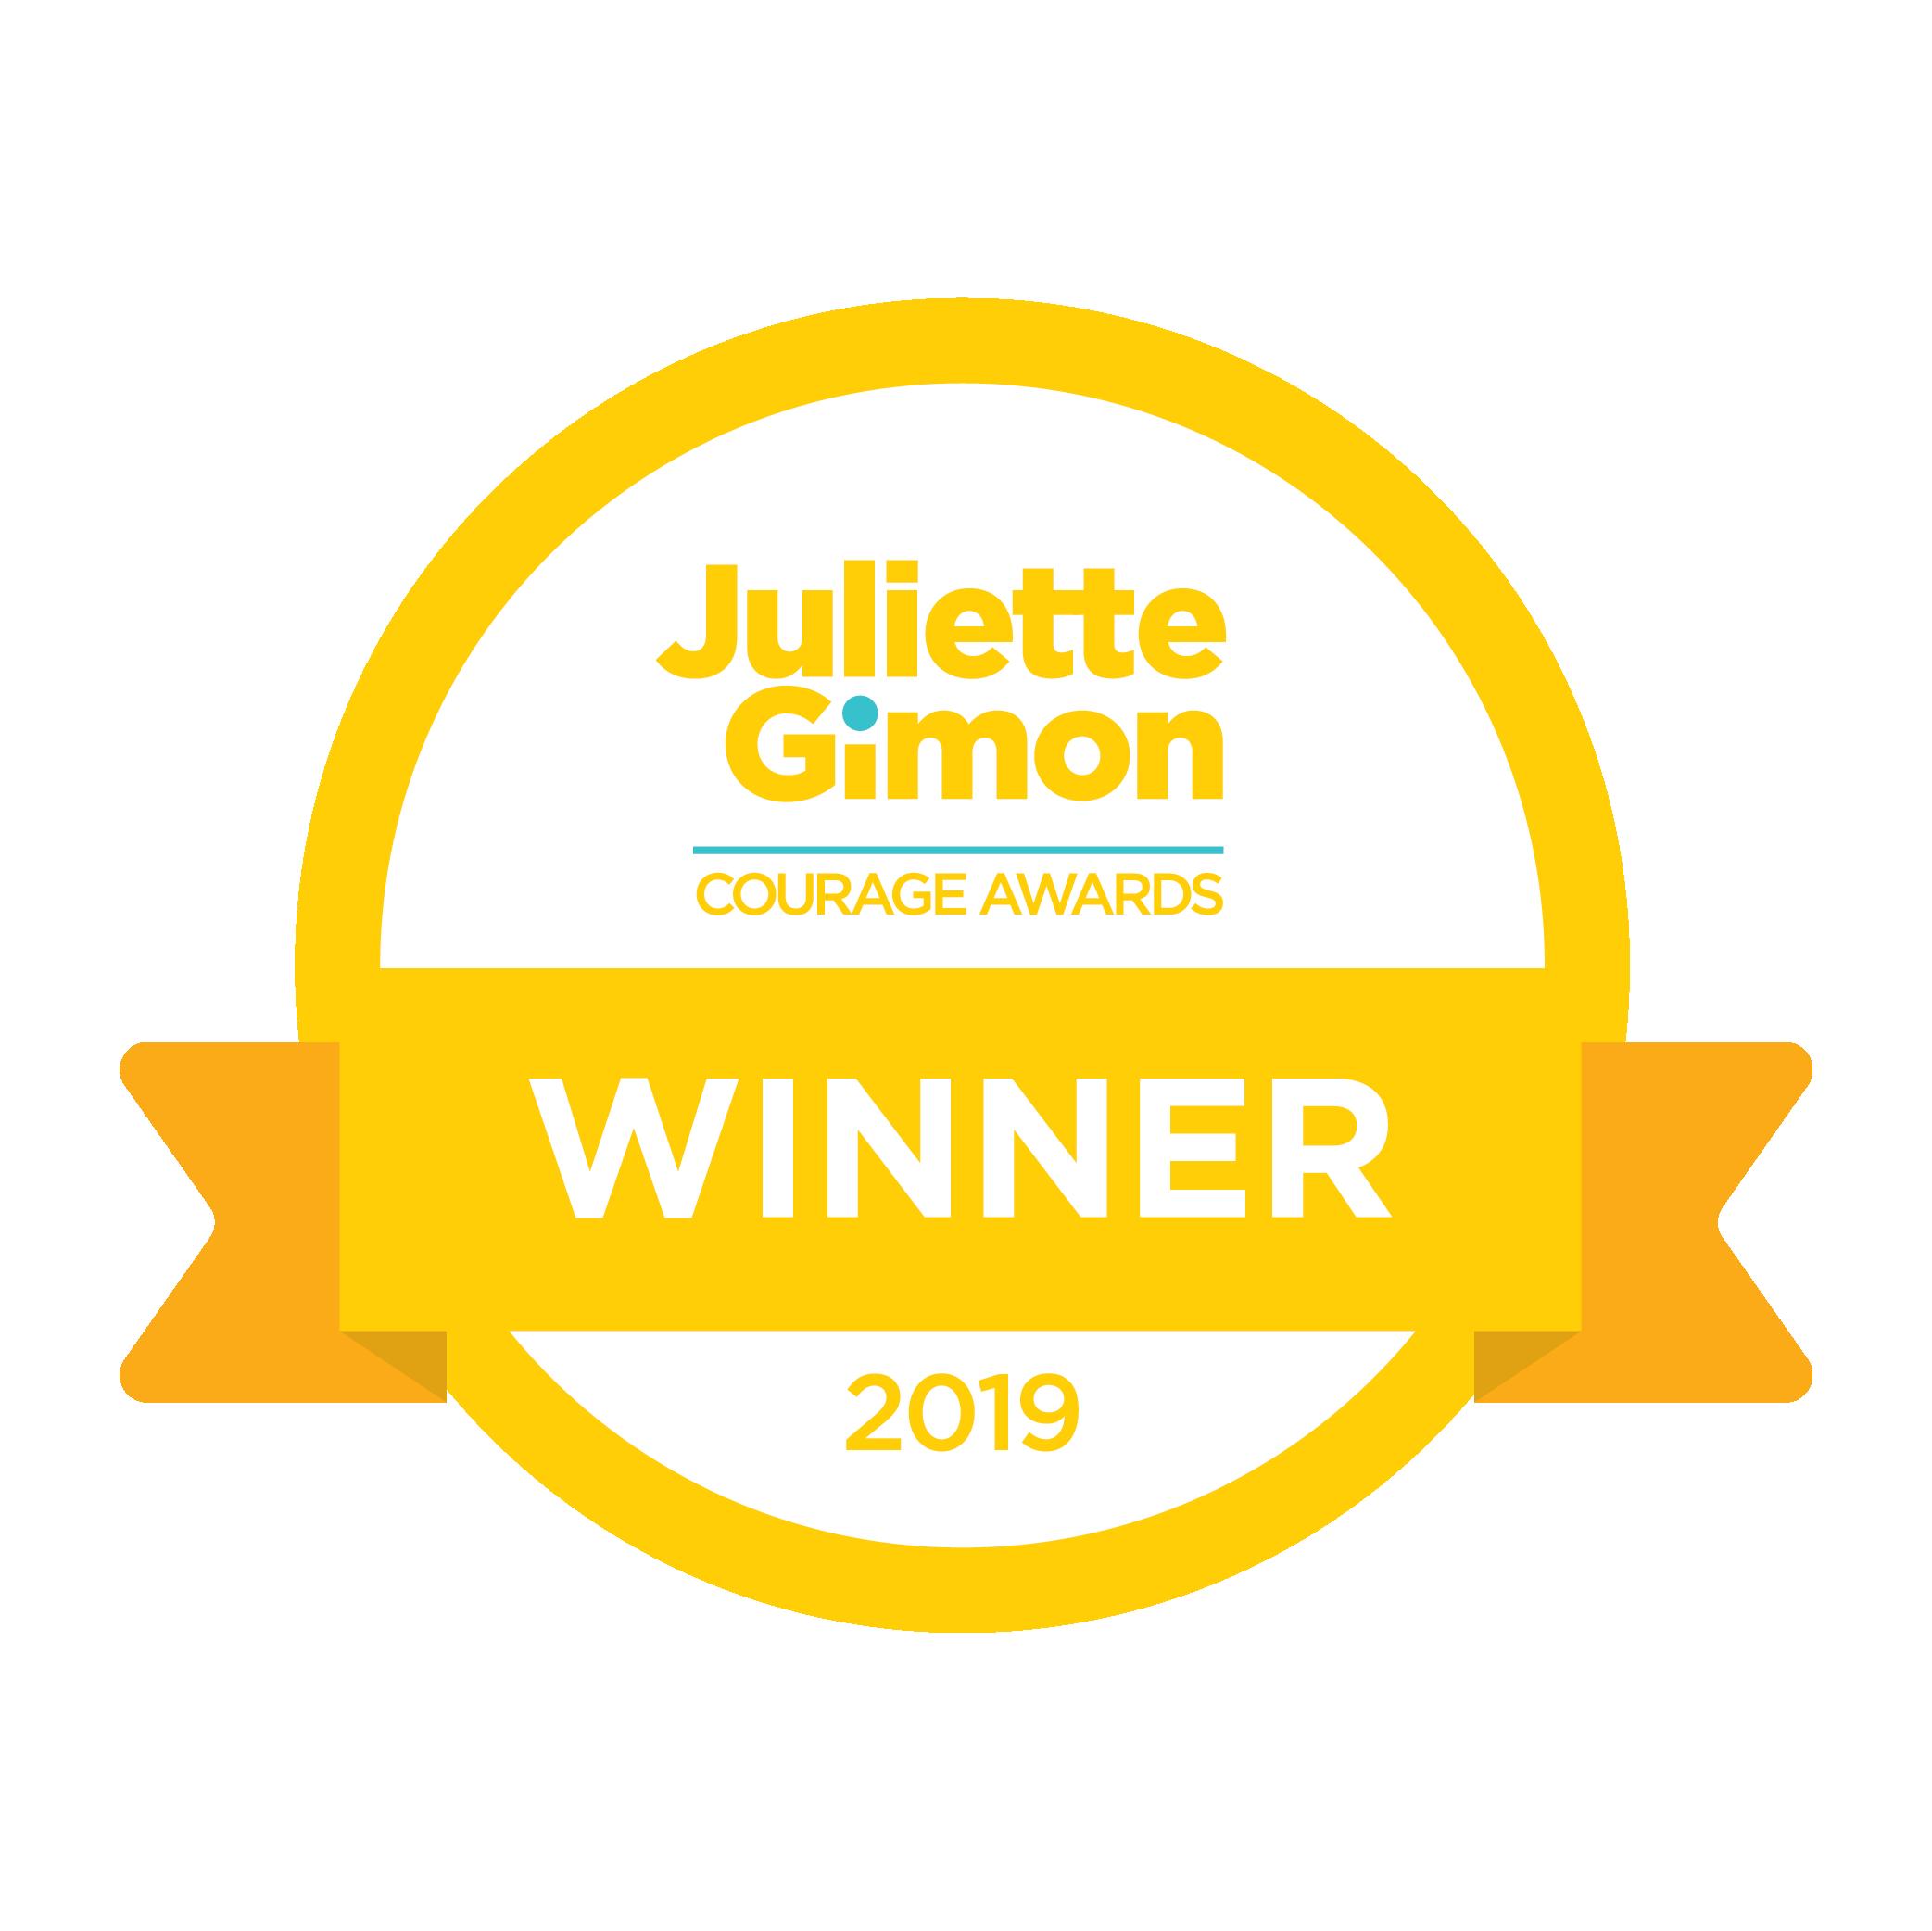 jg-courage-awards-winner